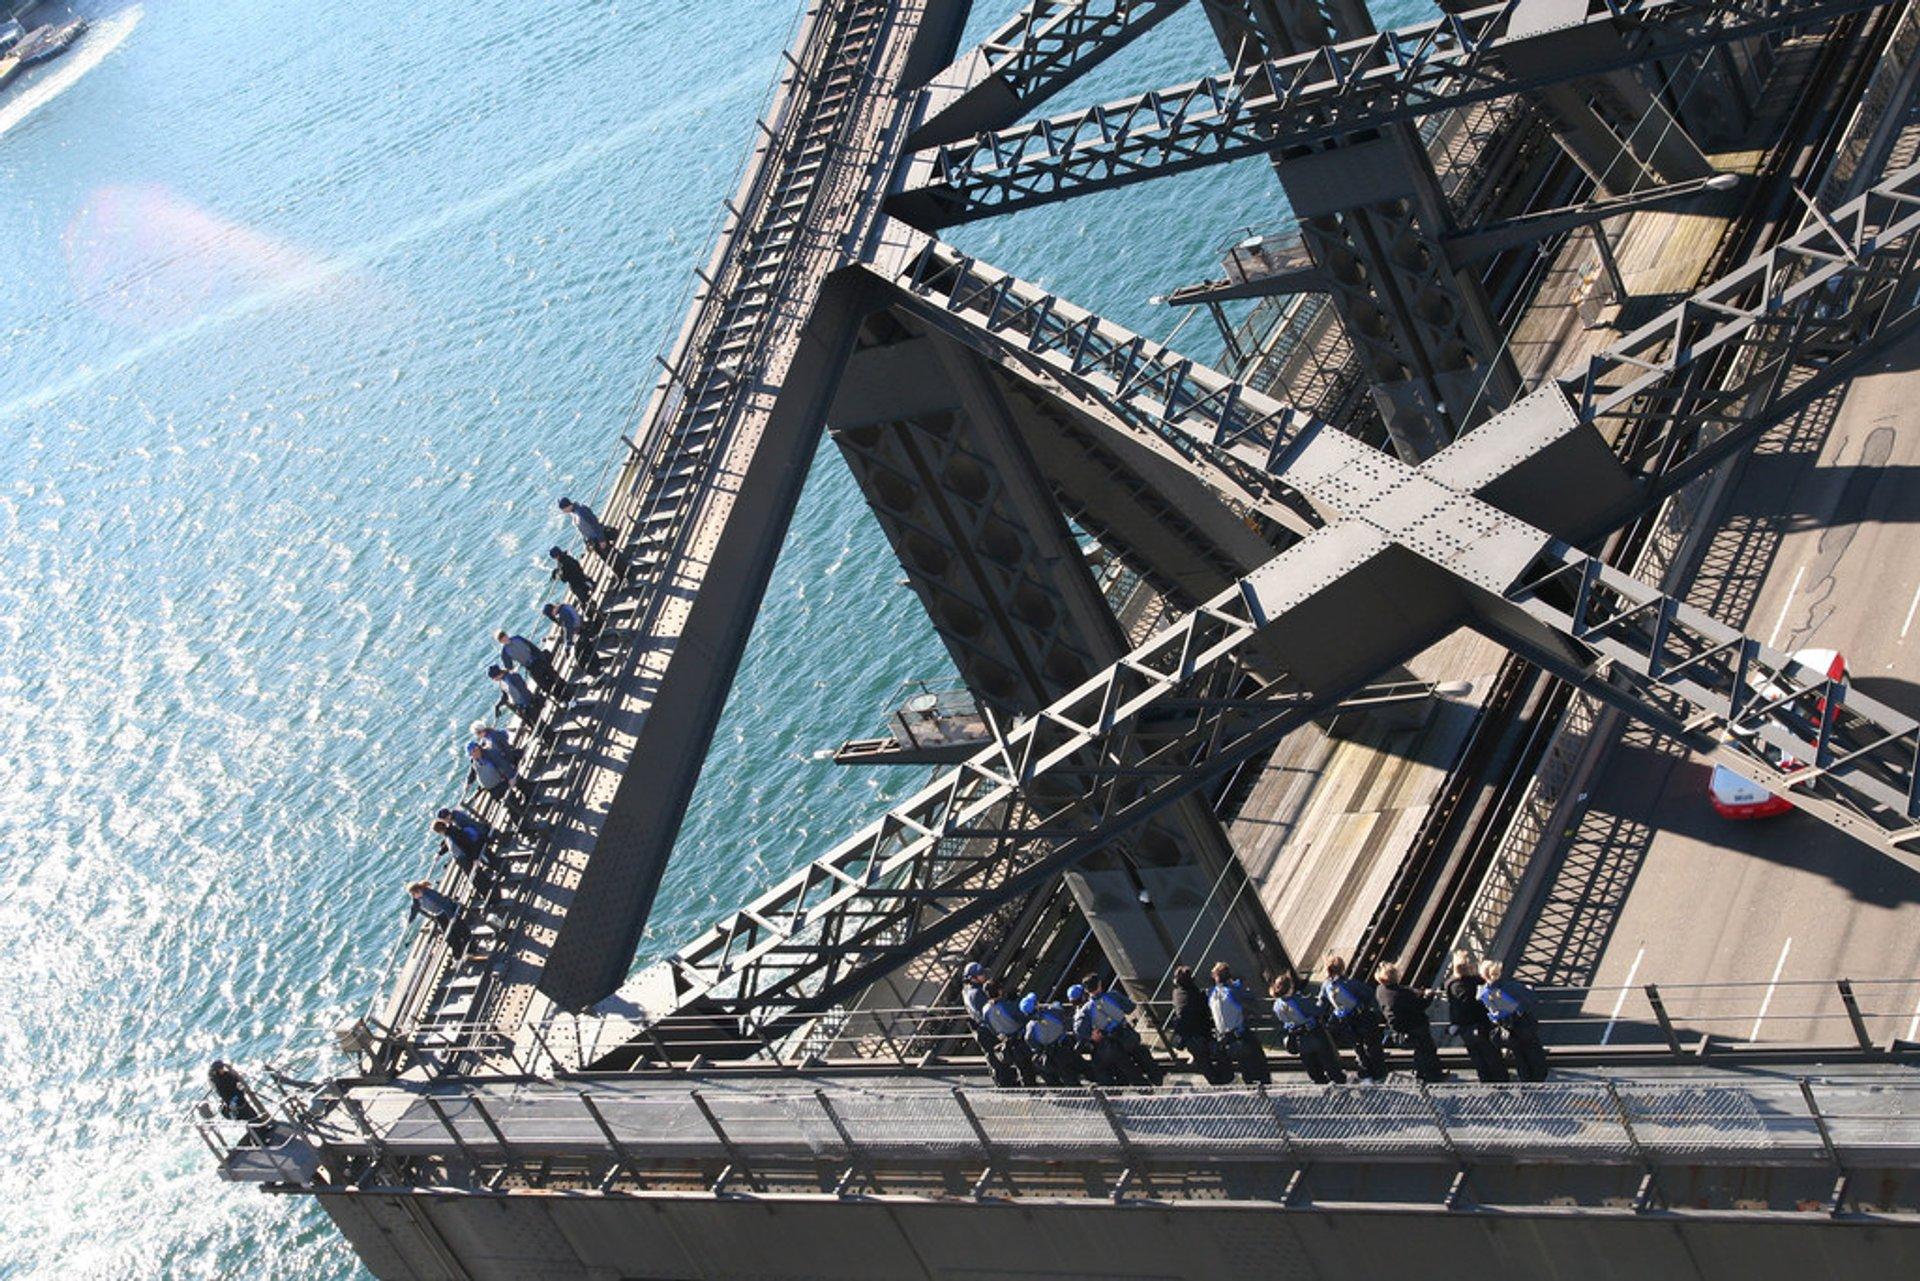 Sydney Harbour Bridge Climb in Sydney - Best Season 2020